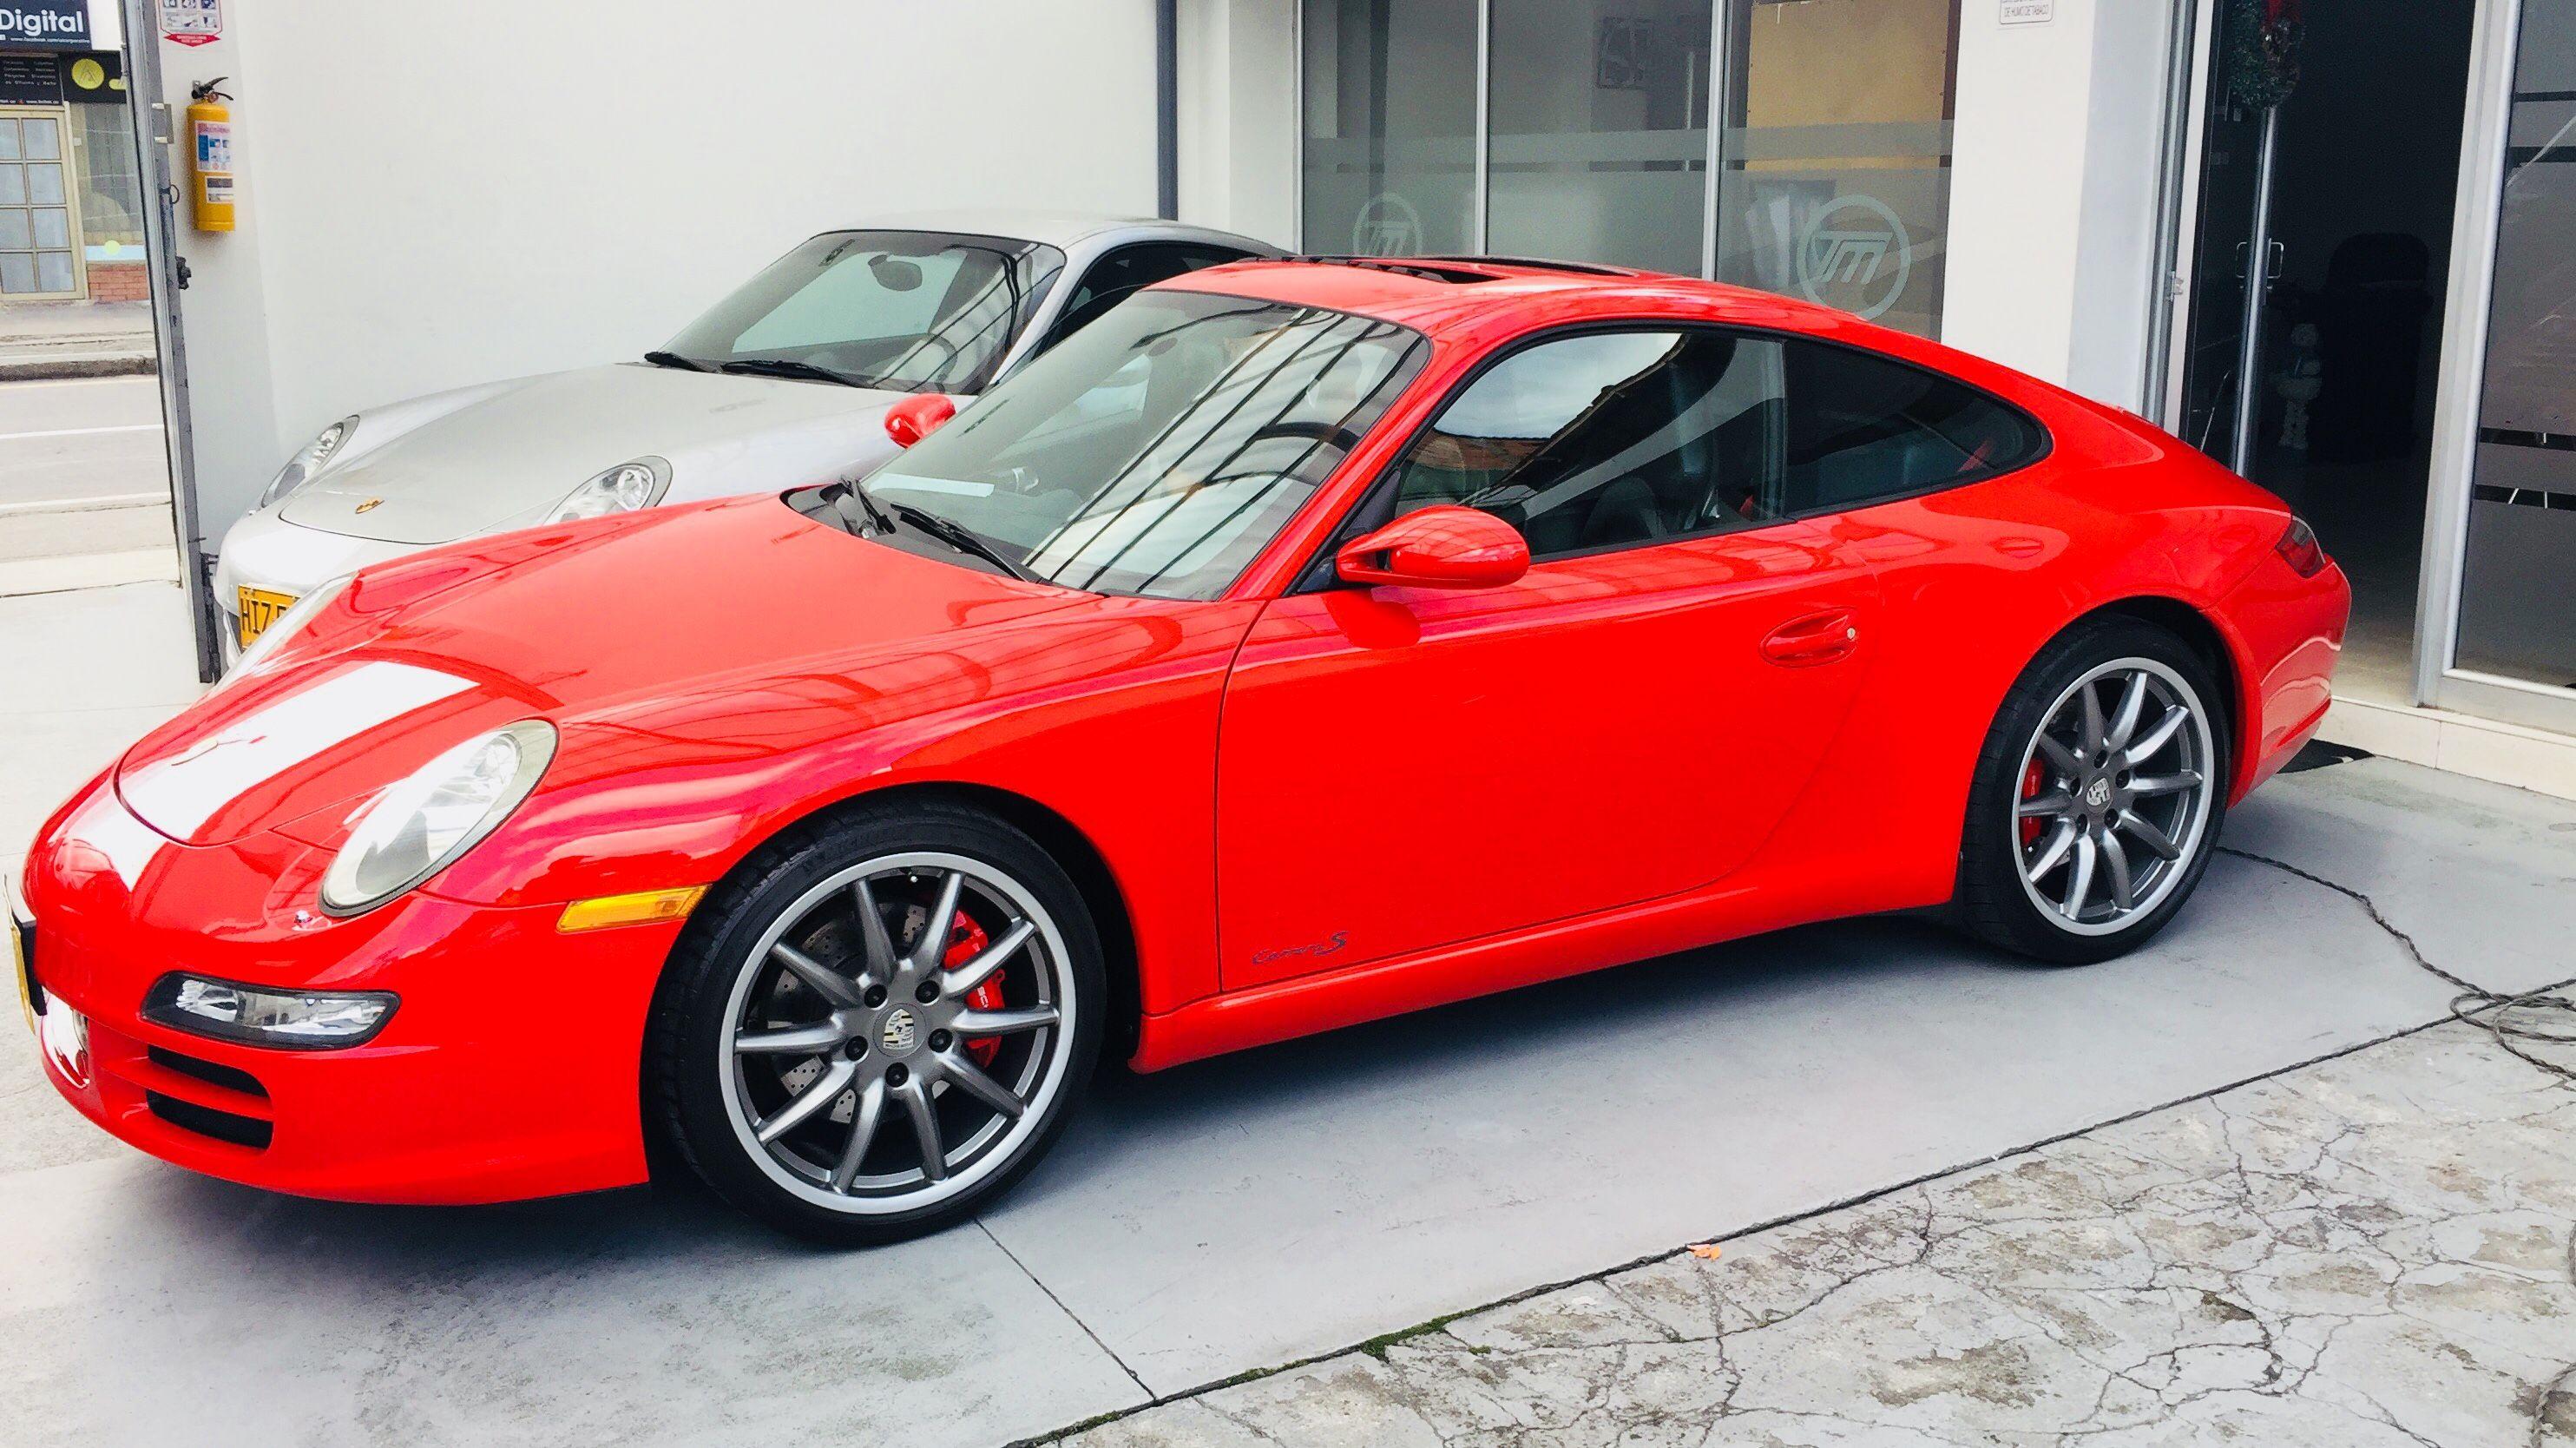 Pin By Corey Tyiska On 997 Vintage Porsche Porsche 911 Porsche Cars